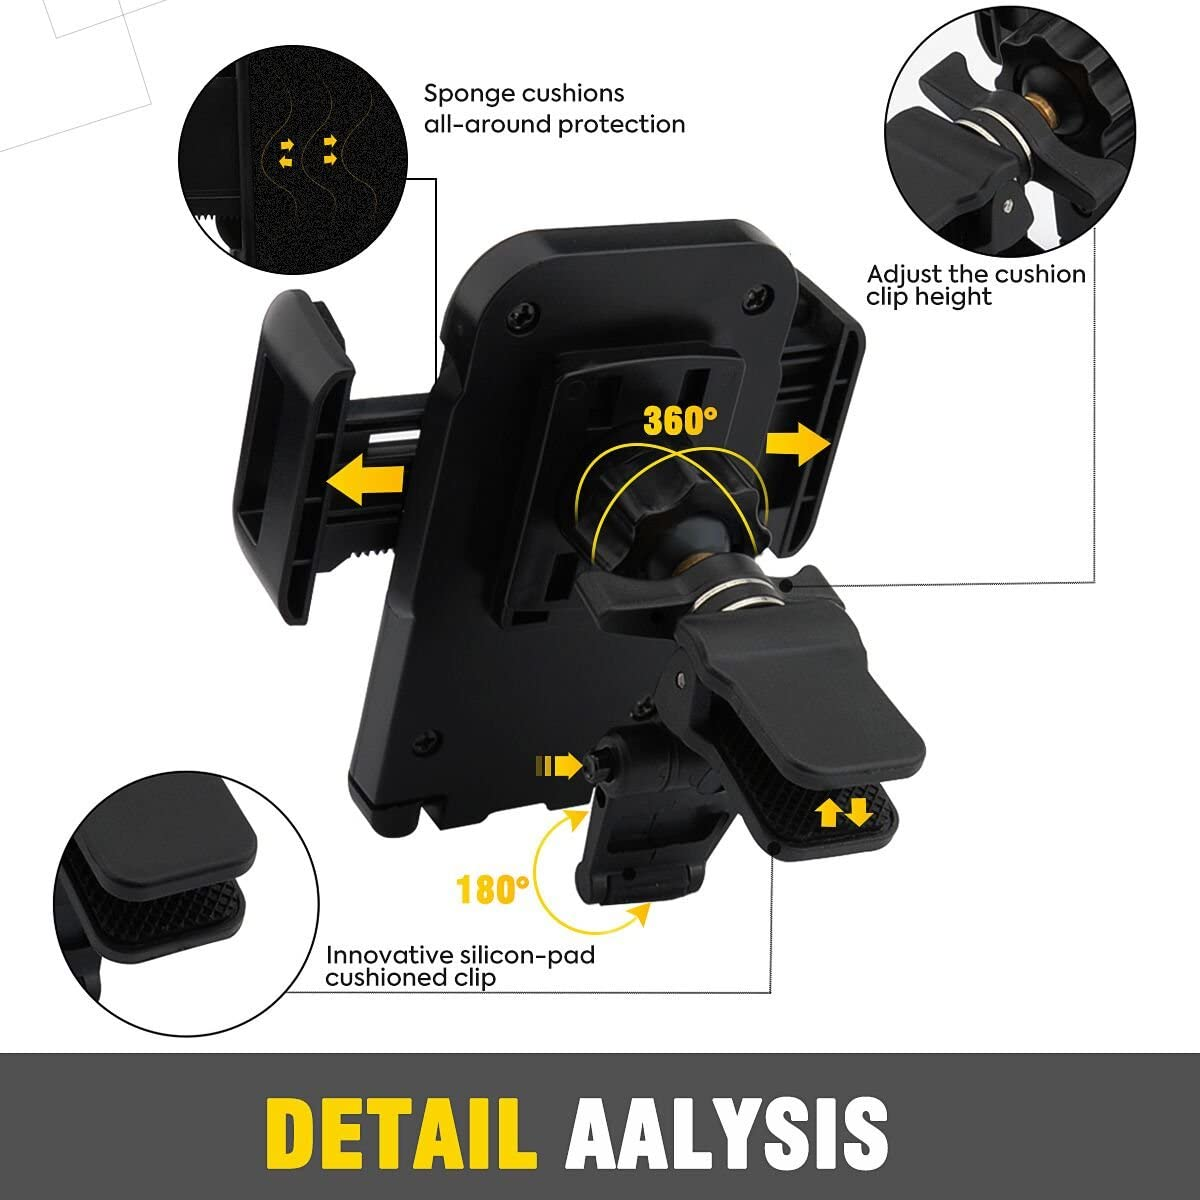 OTEMIK detail analysis of phone holder